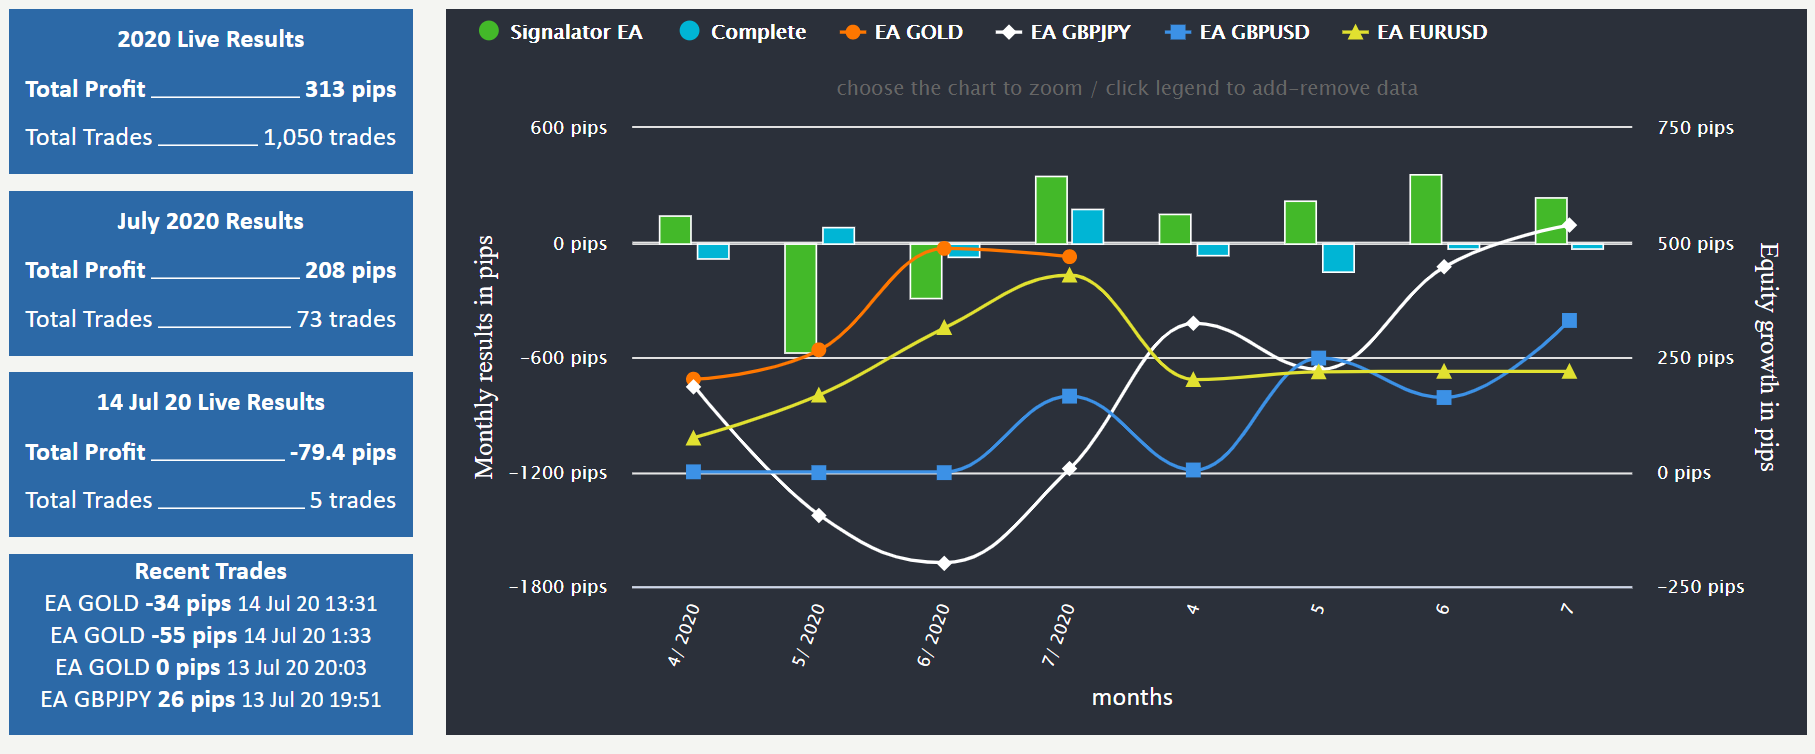 Signalator trading results